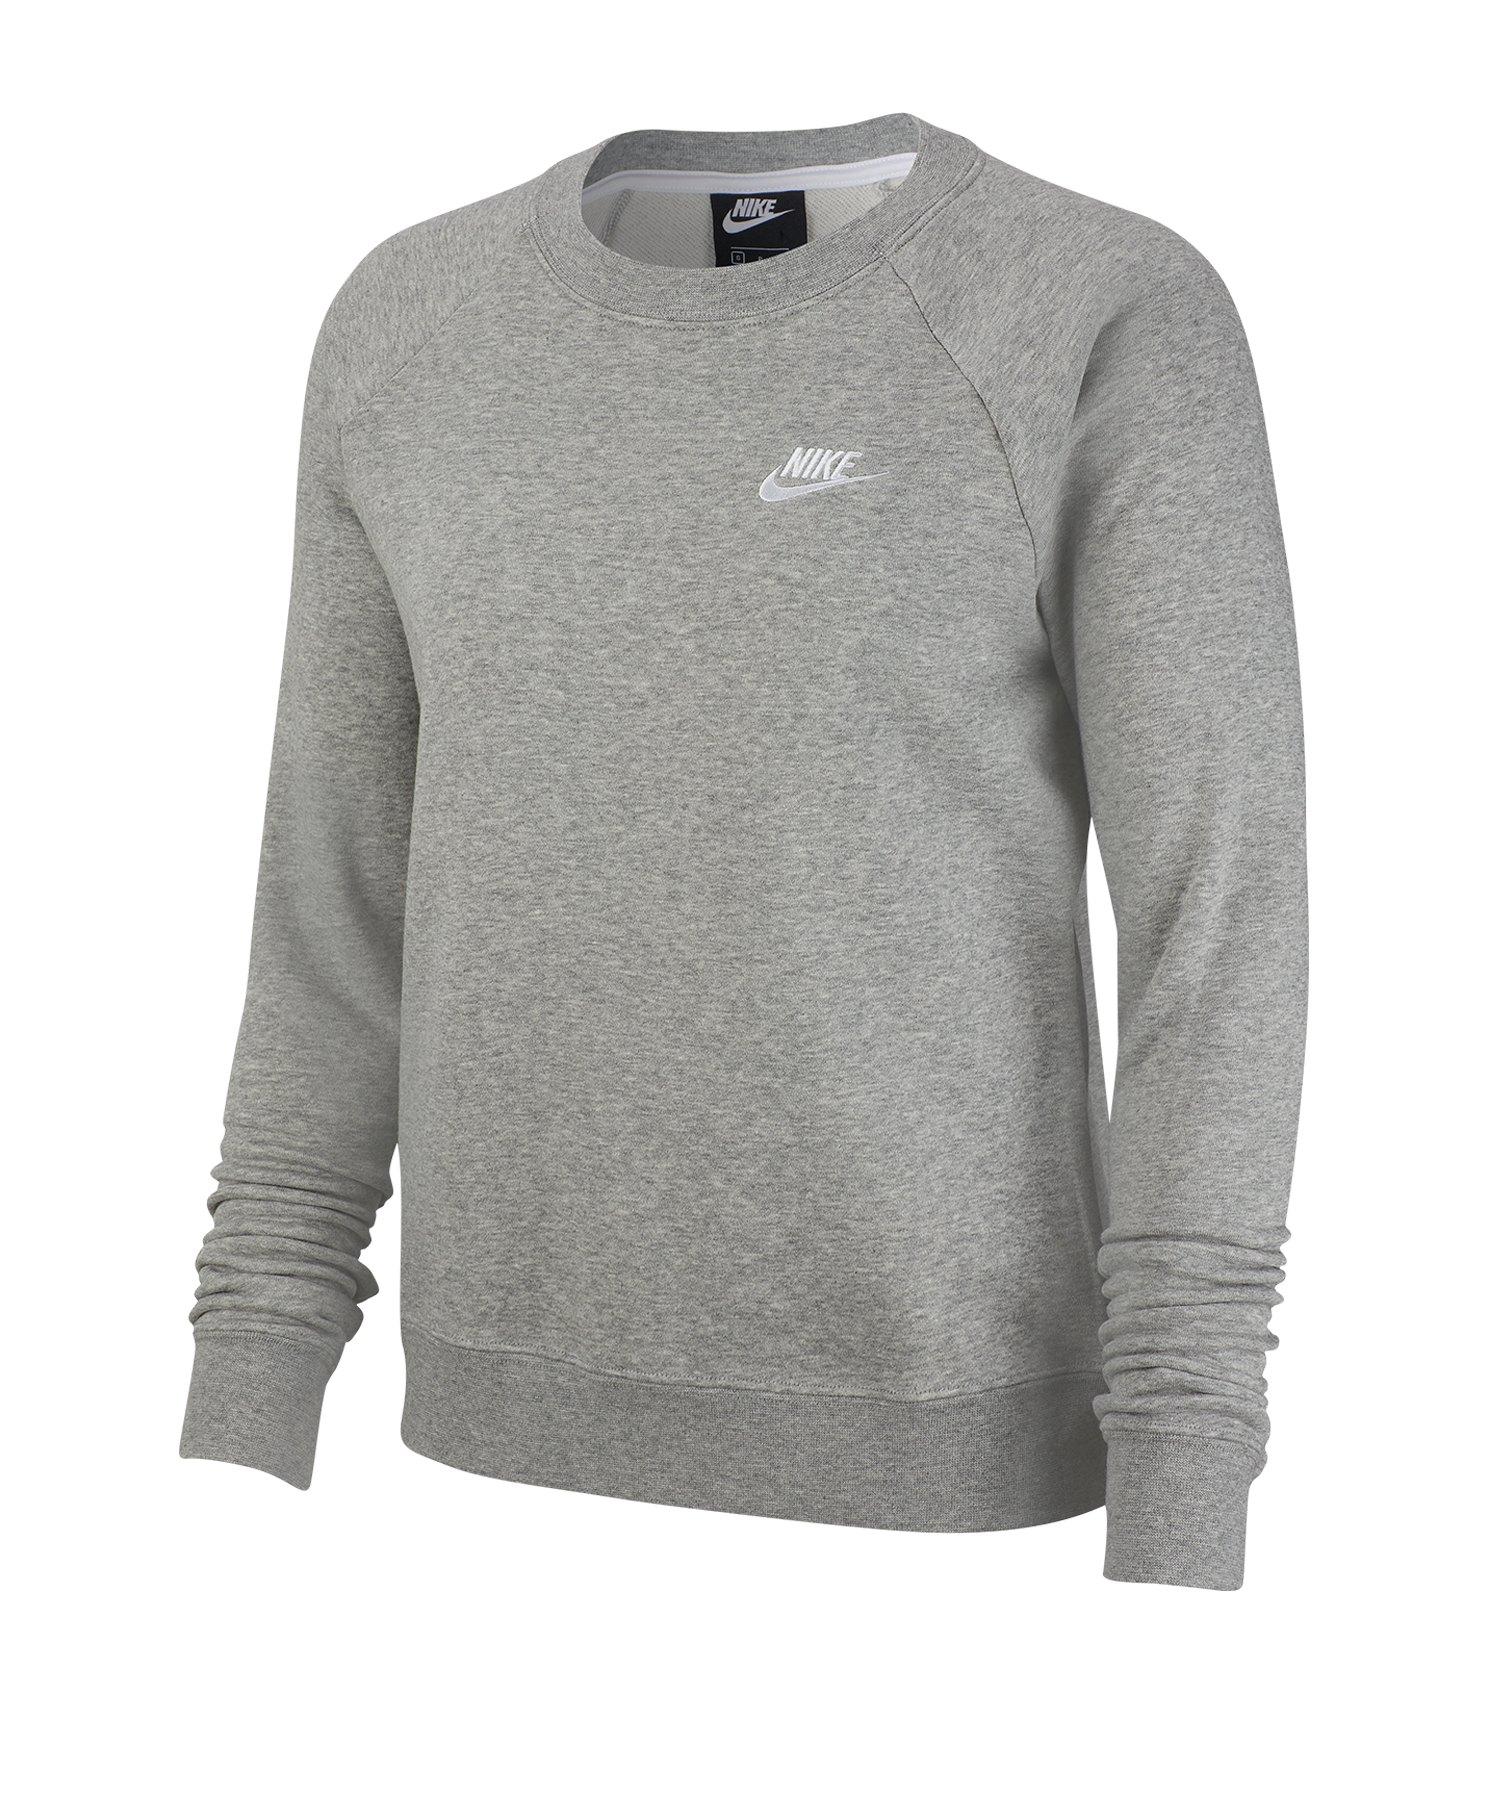 Nike Essential Fleece Sweatshirt Damen Grau F063 - grau